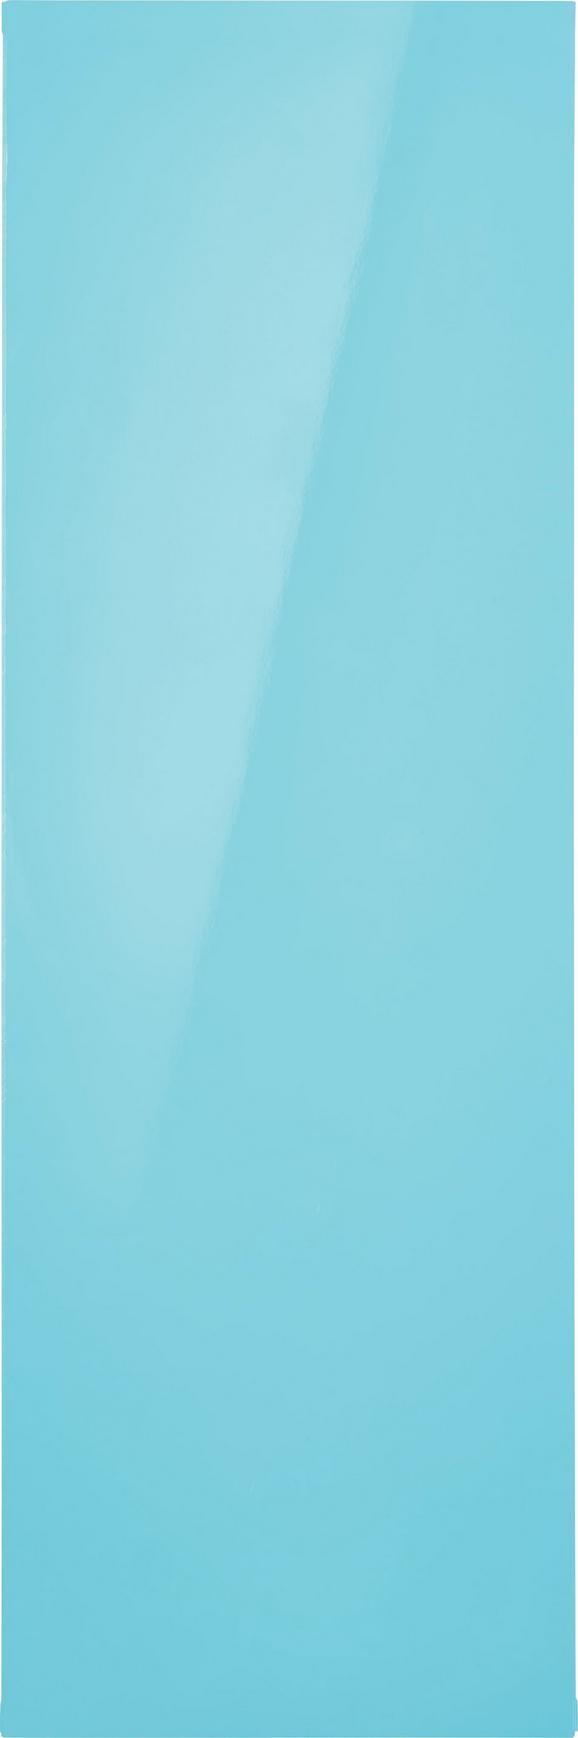 Hängeschrank in Hellblau - Hellblau, MODERN, Holzwerkstoff (90/30/34cm) - MÖMAX modern living